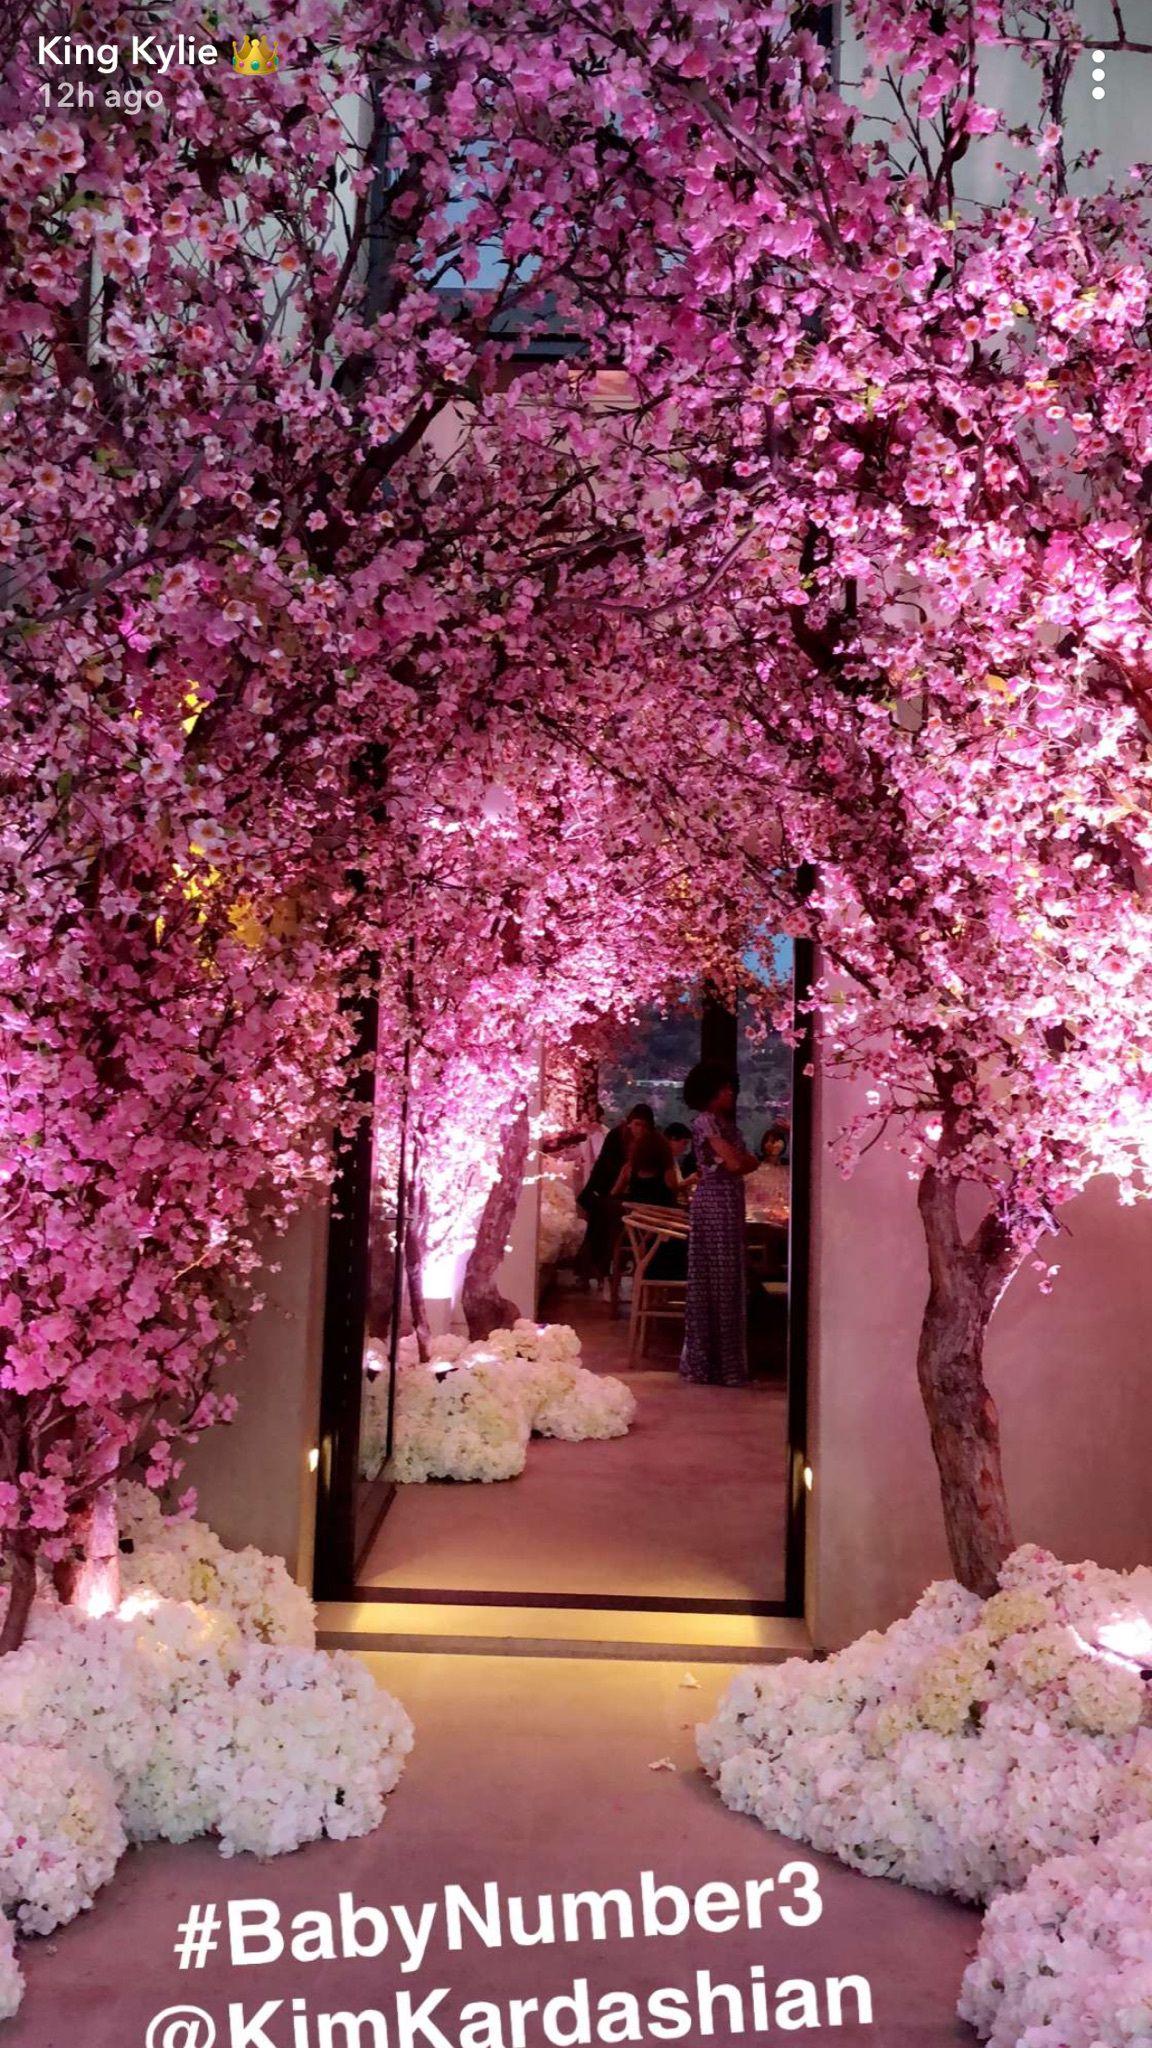 kylie jennersnapchat kim kardashian baby shower decorations wedding decorations alice